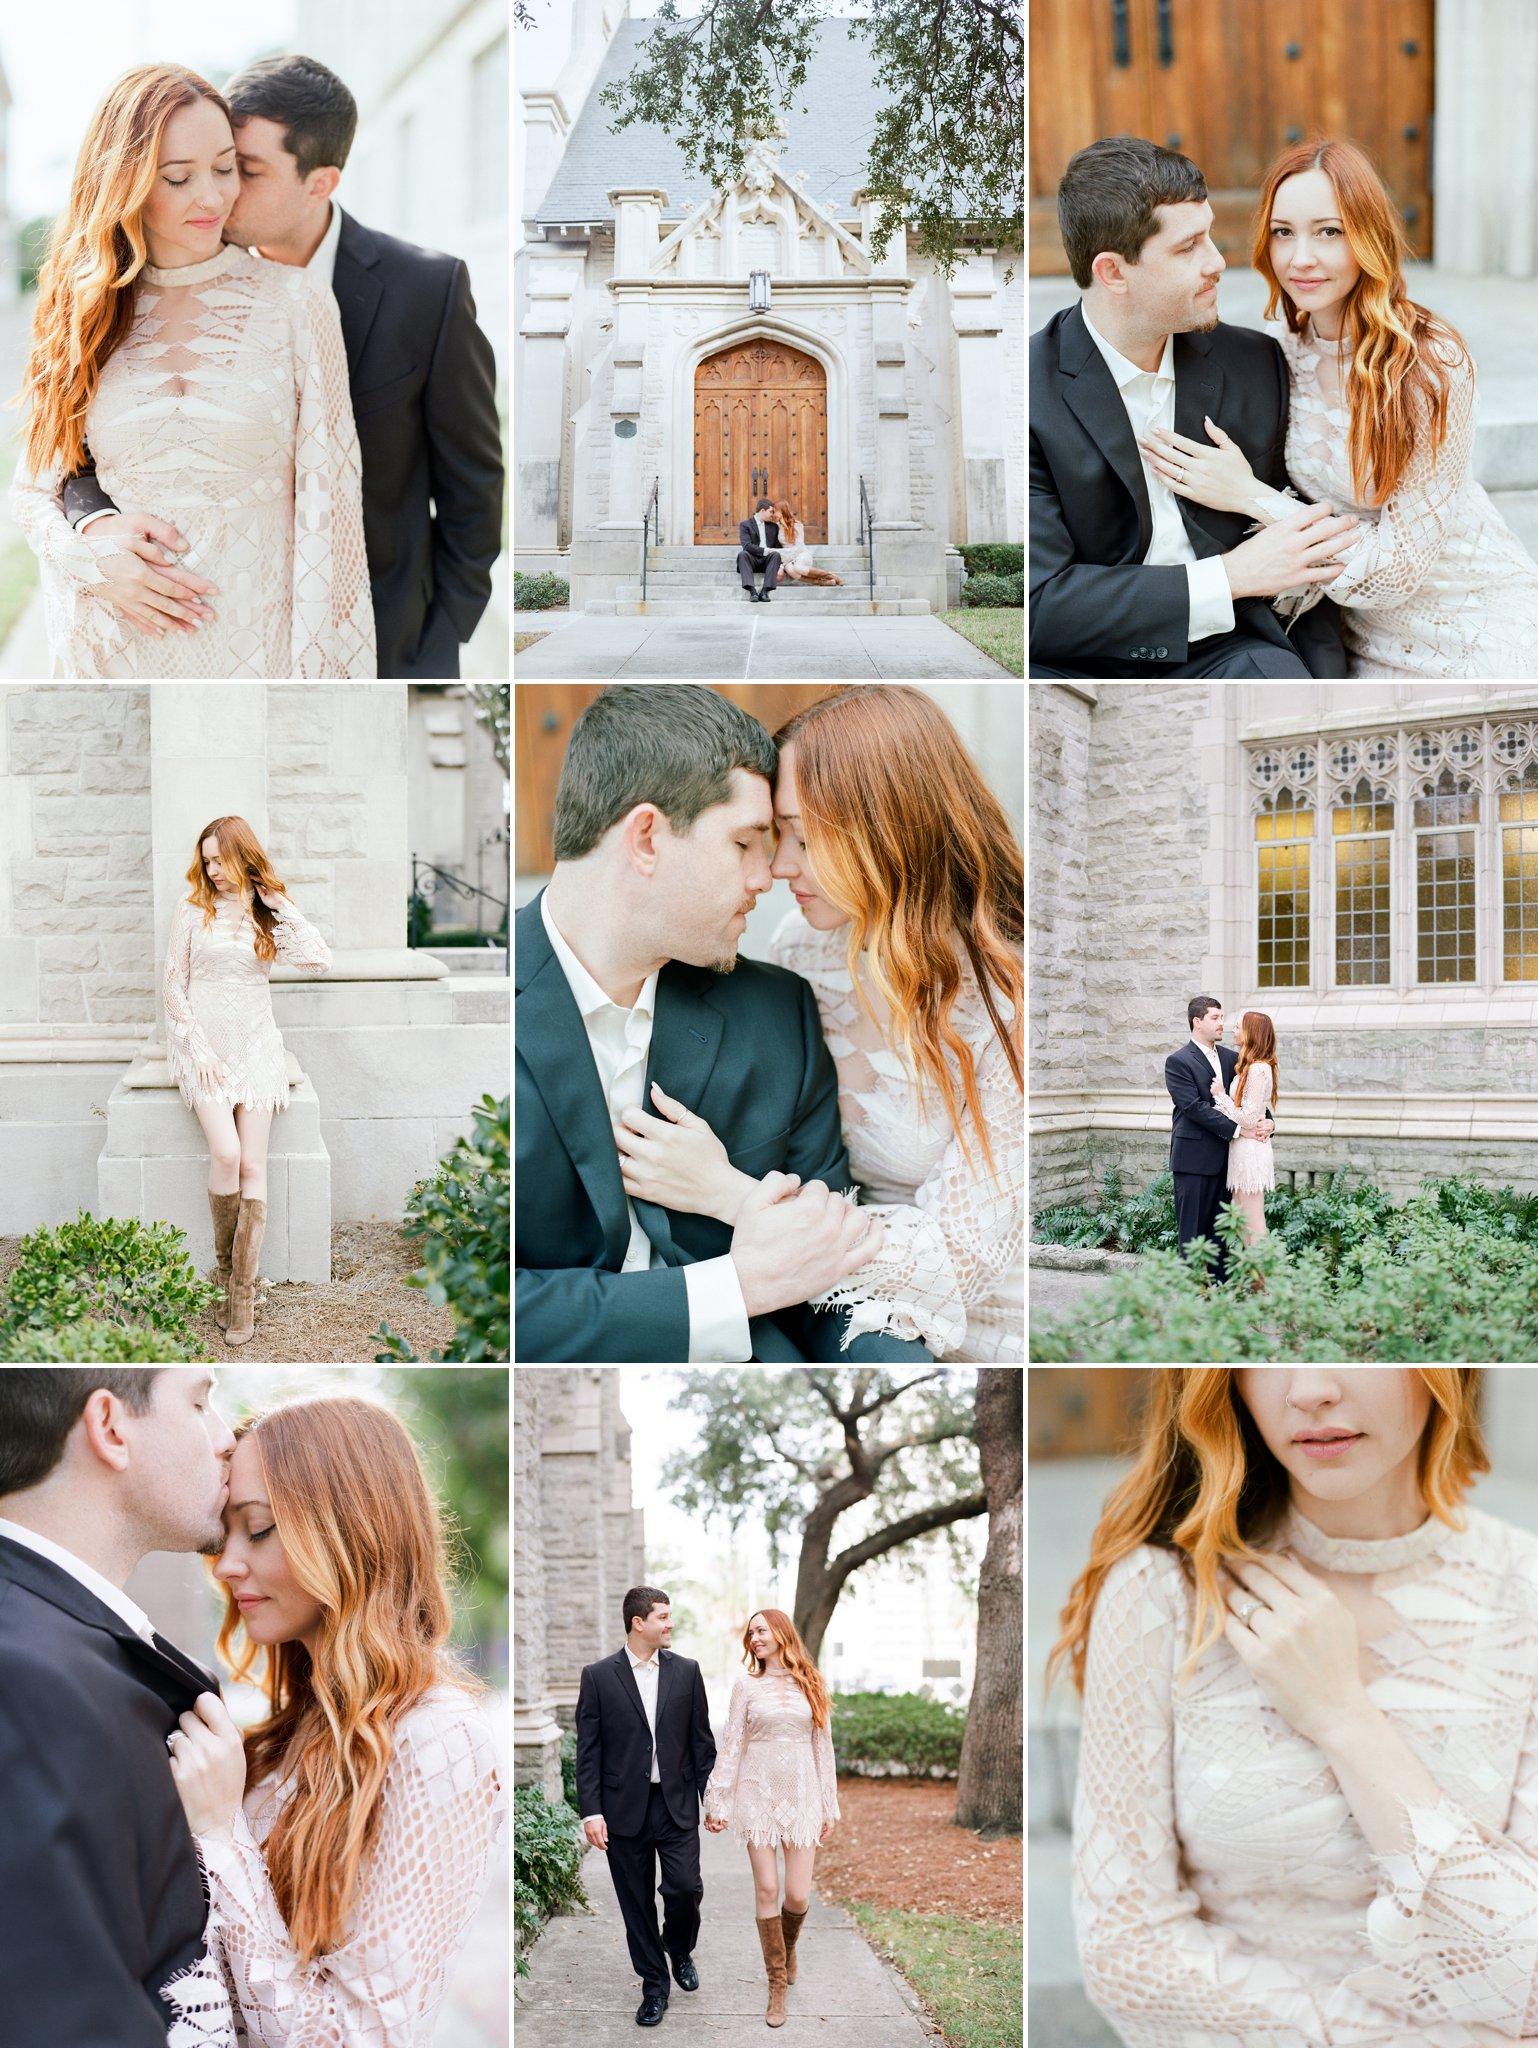 st augustine wedding photographer shannon griffin photography_0003.jpg